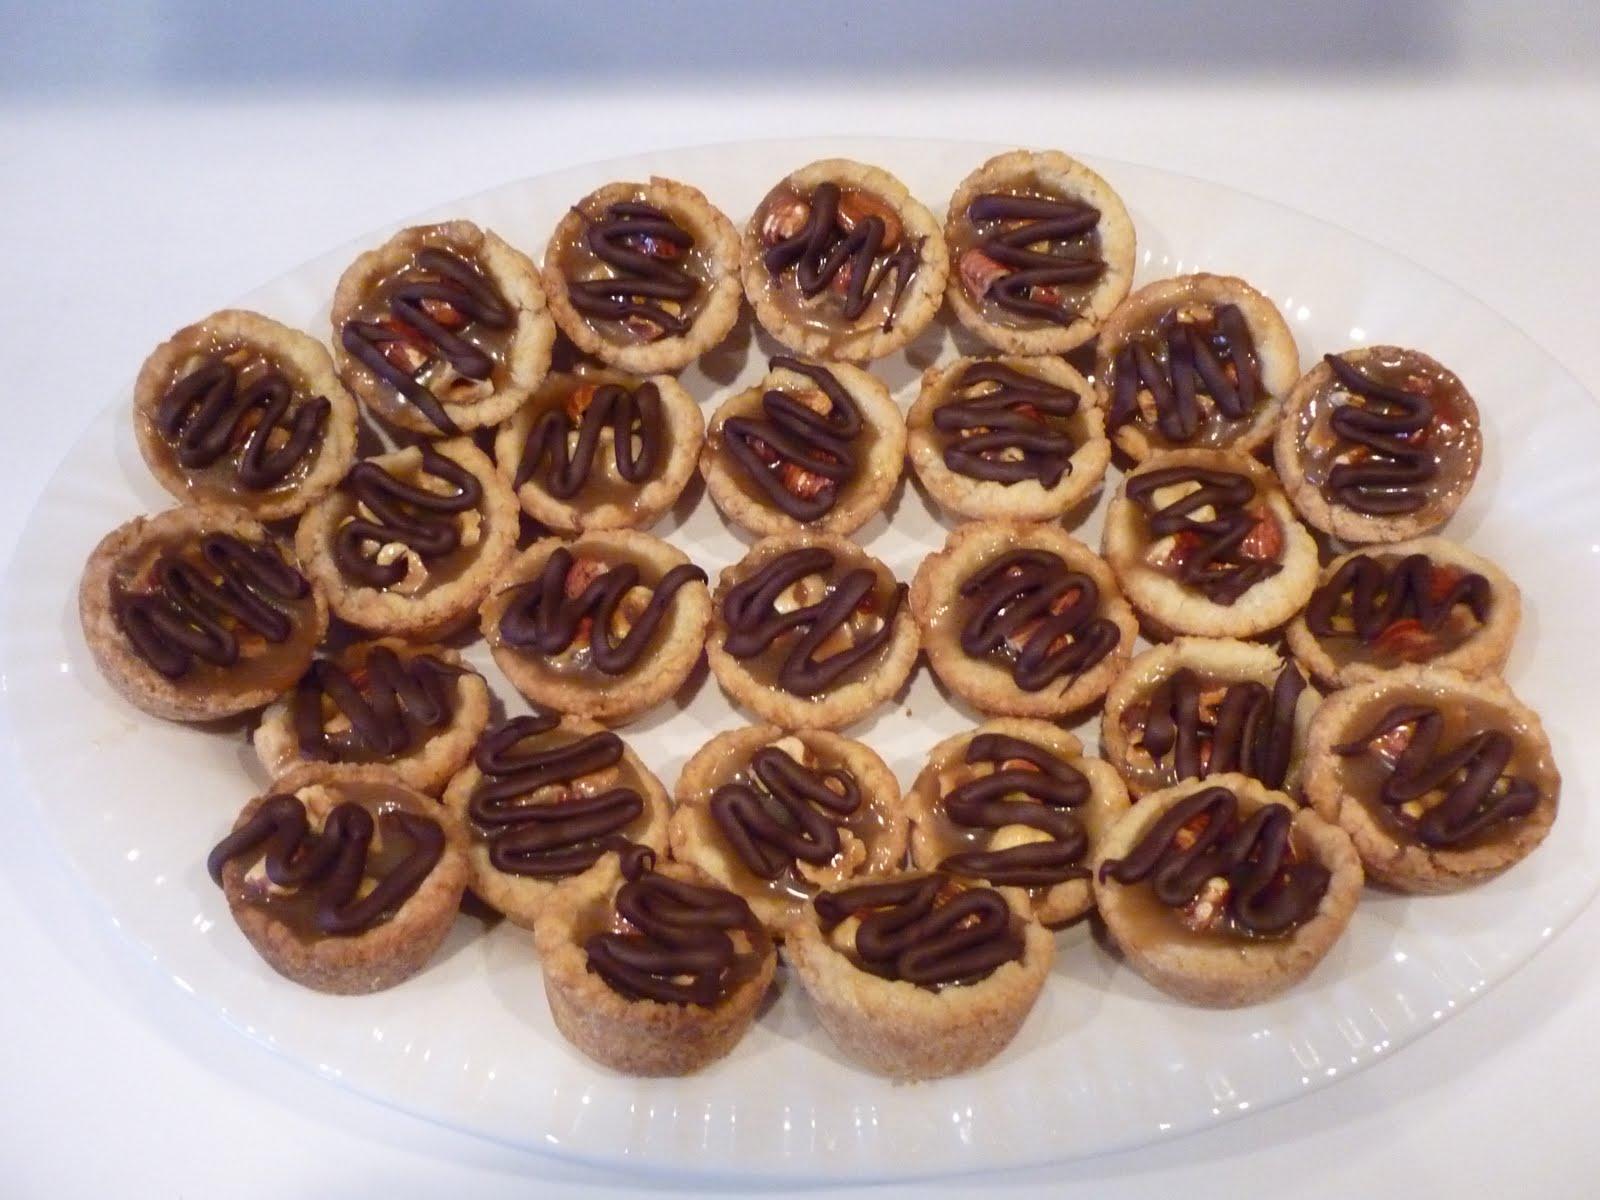 All Betz Off: Caramel-Hazelnut Mini Tartlets